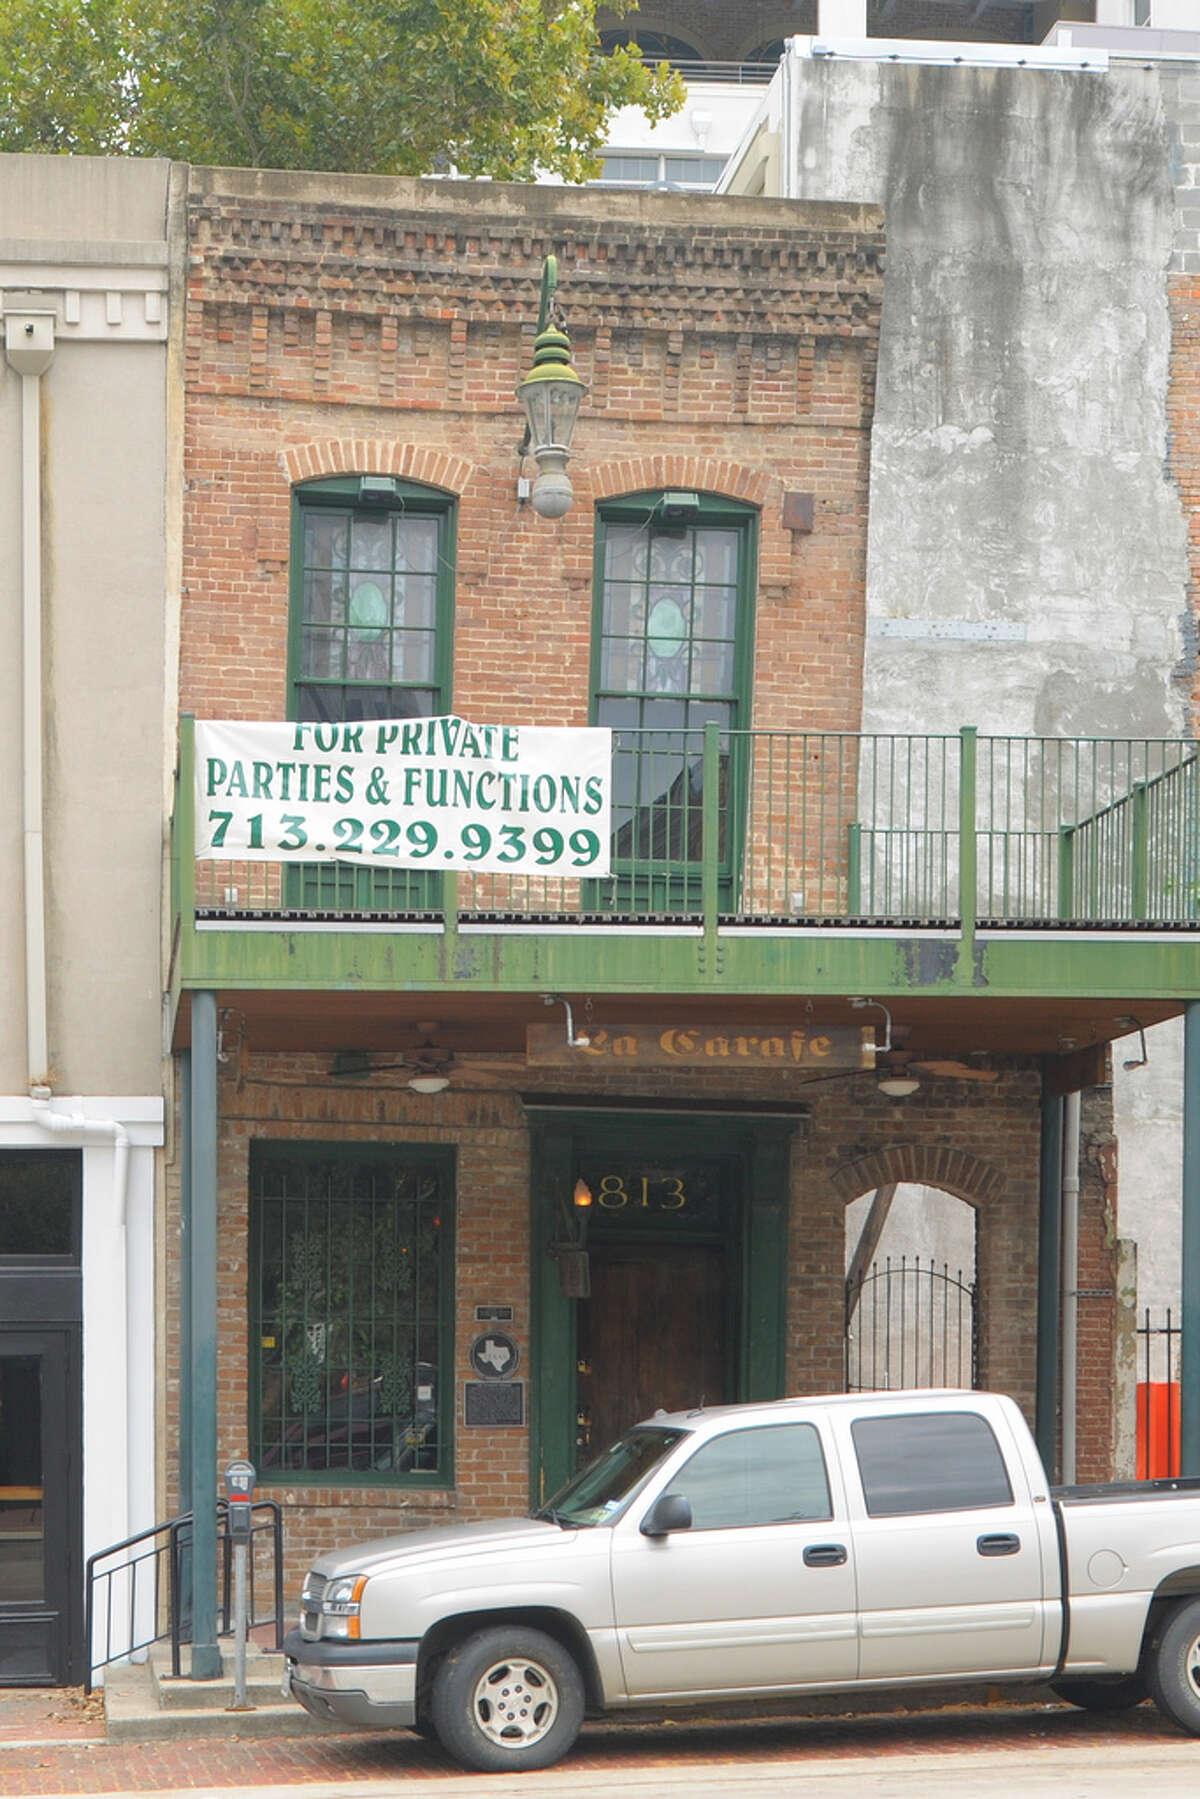 Name: Kennedy Bakery BuildingBuild date: 1861Location: 813 Congress Avenue